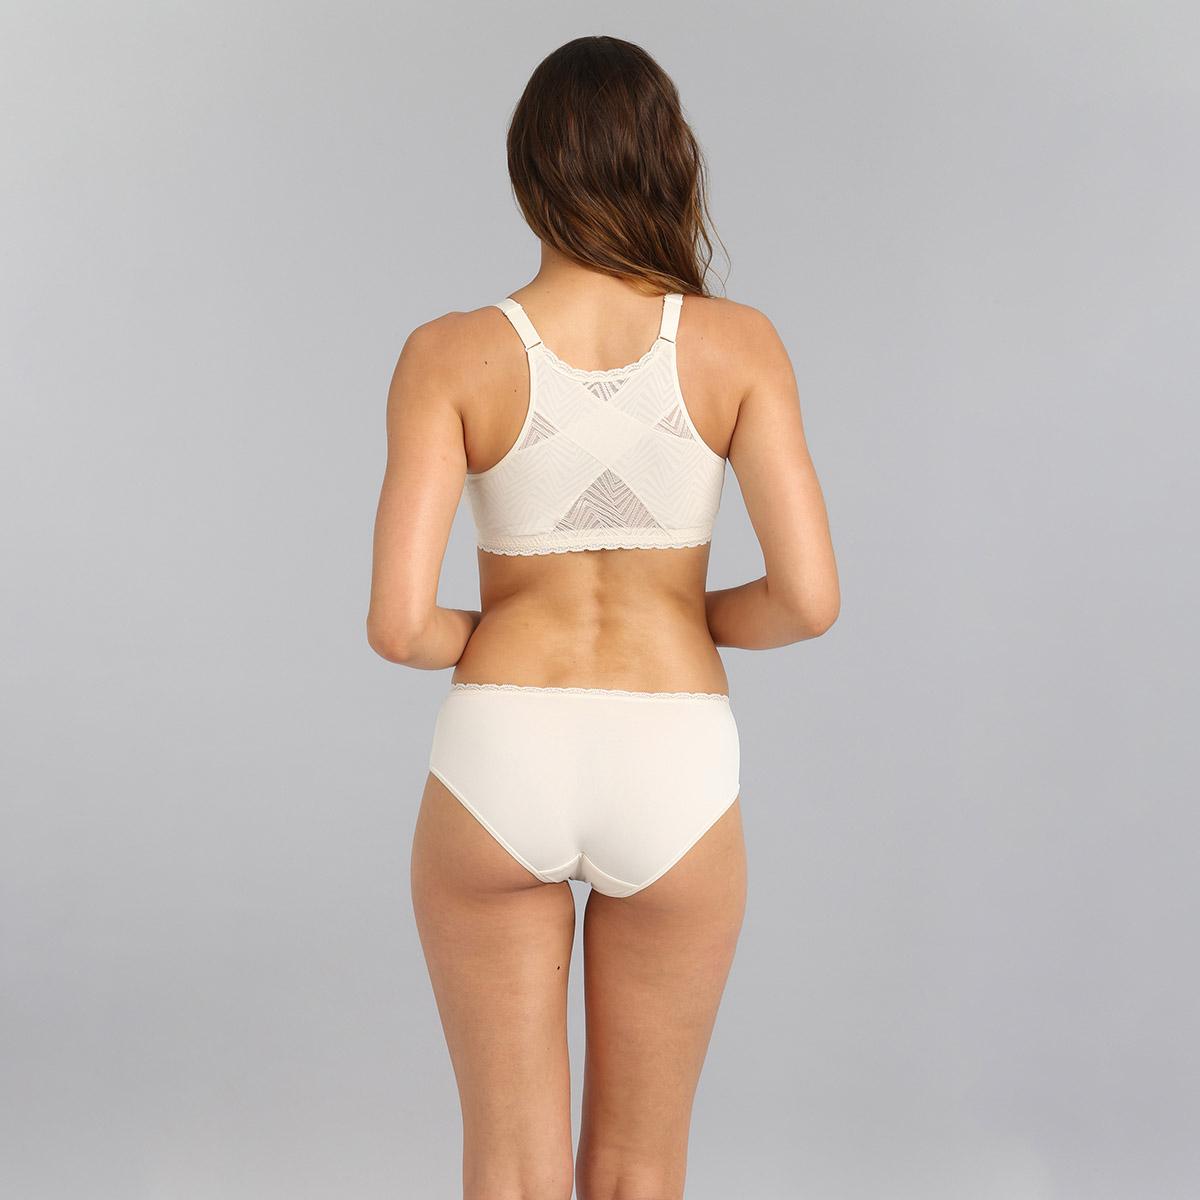 Culotte midi dentelle ivoire Ideal Posture, , PLAYTEX